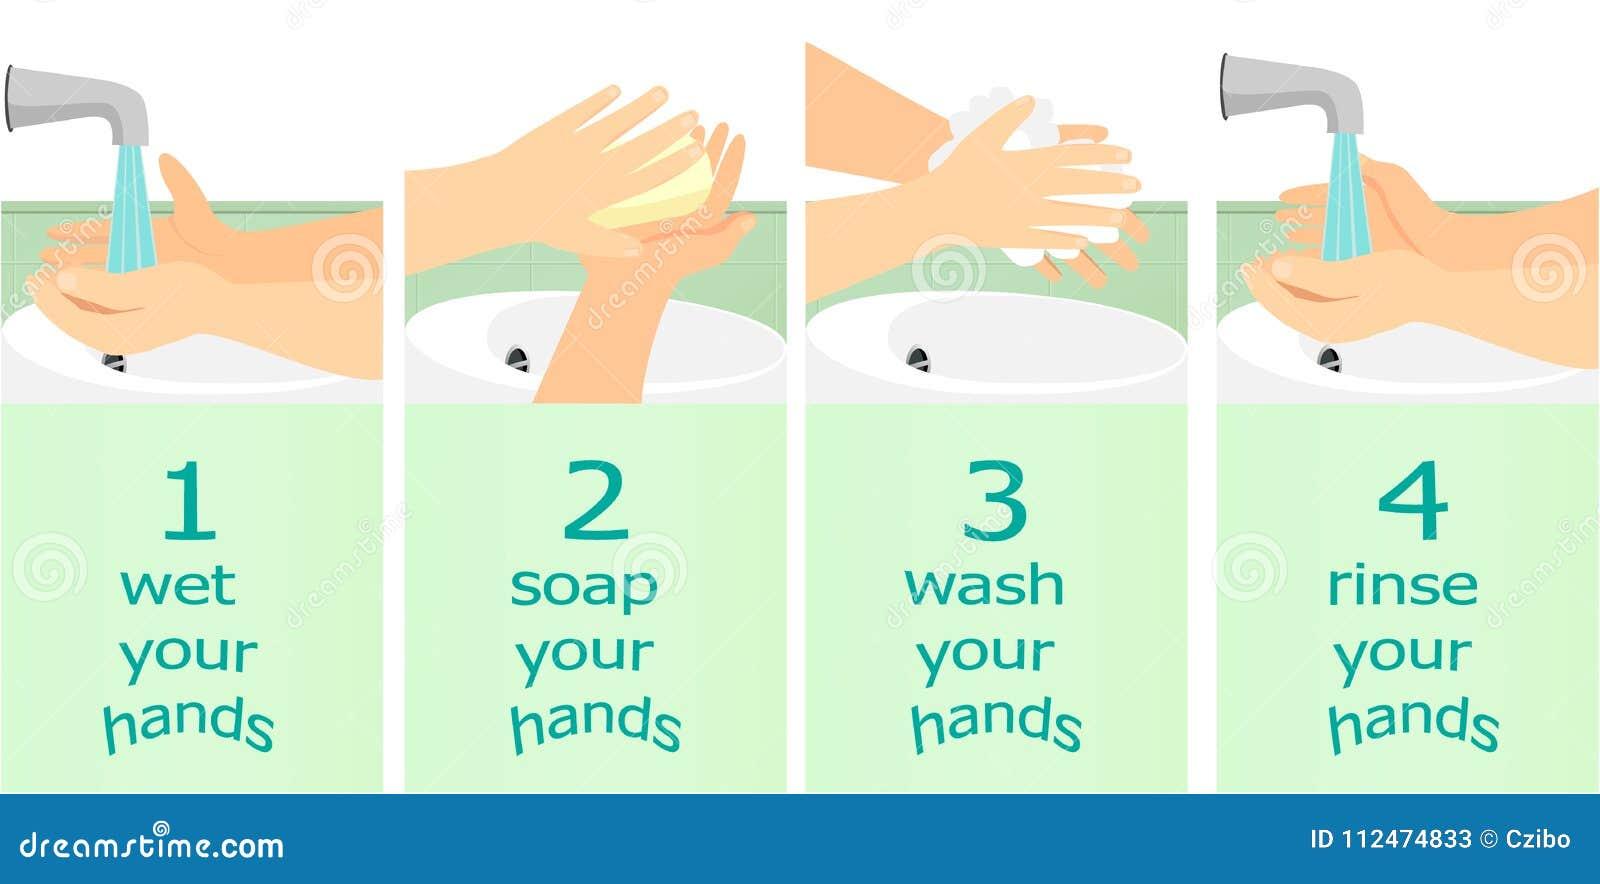 Washing Hands Instruction Flat Bacground Stock Vector Illustration